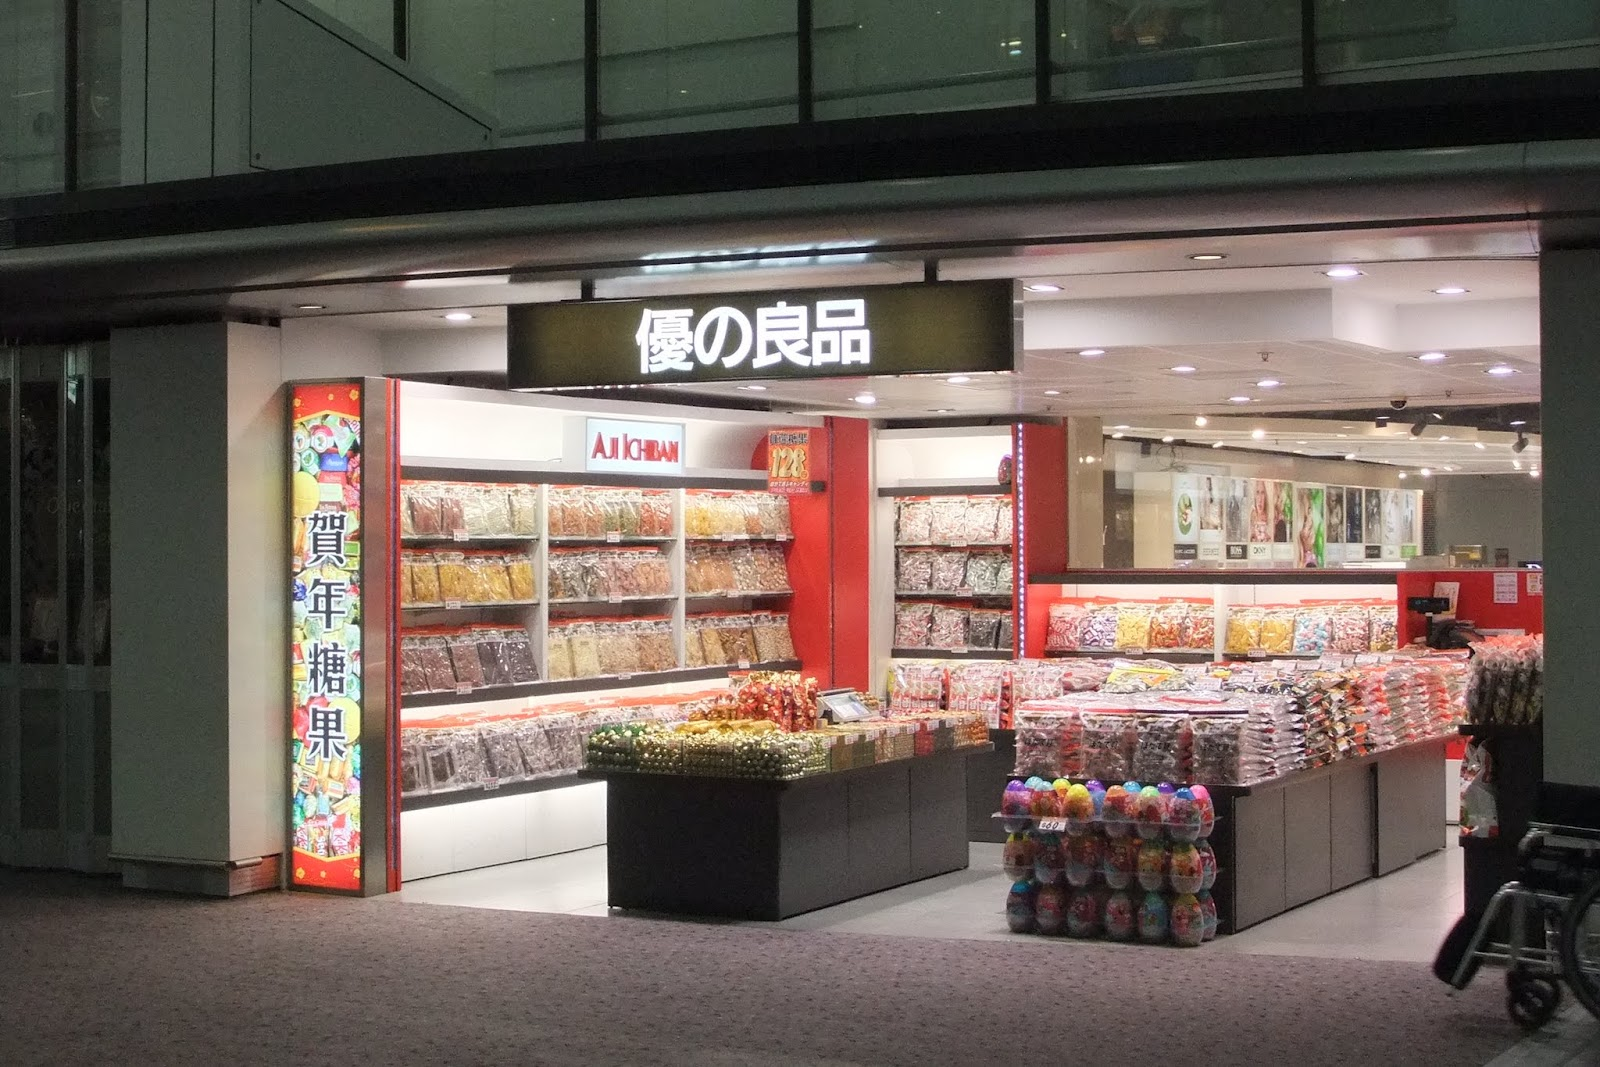 hongkong-international-airport-yunoryouhin 優の良品